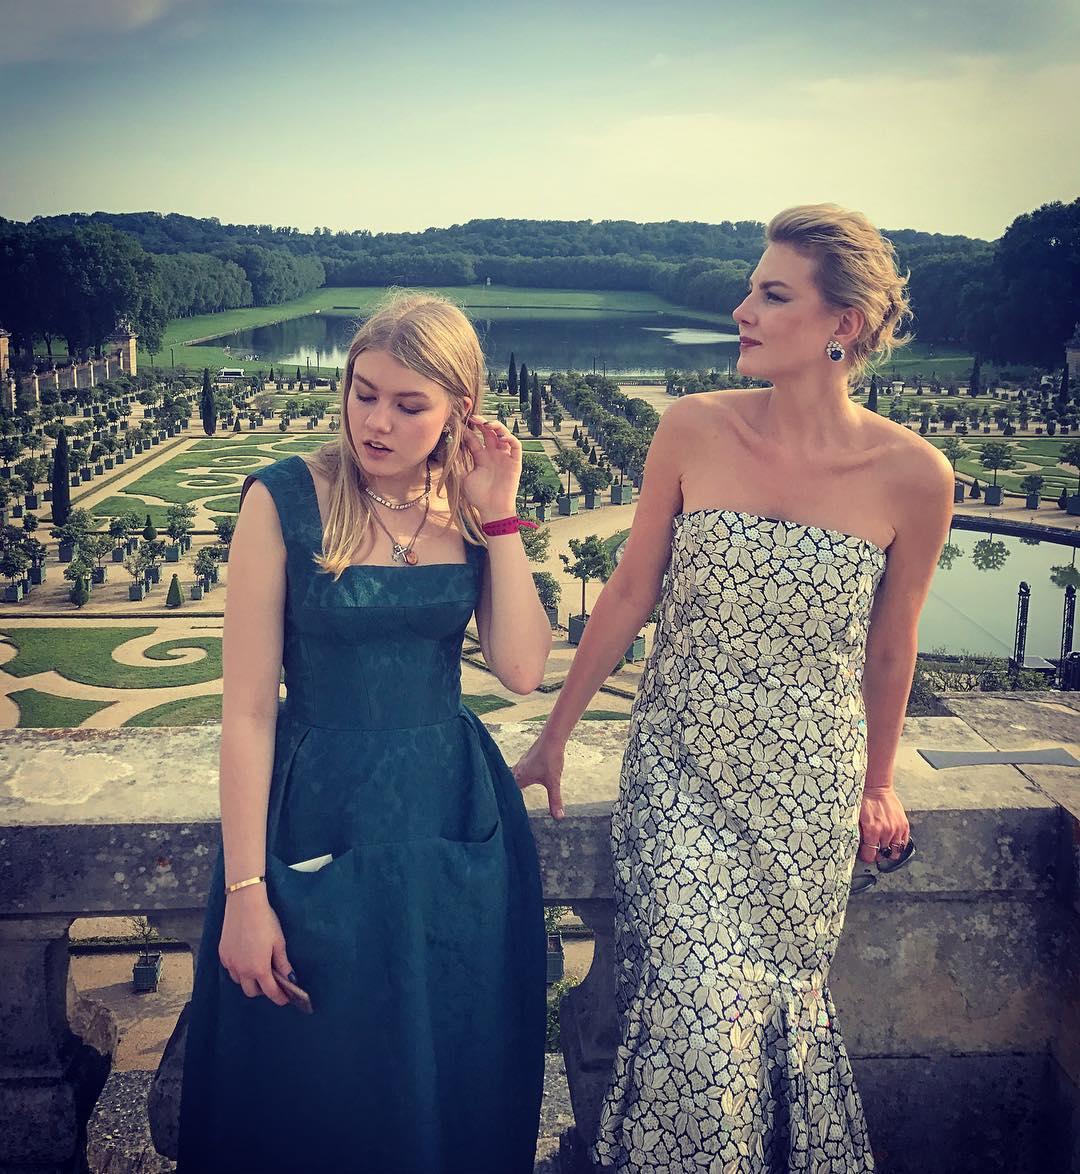 Рената Литвинова опровергла слухи о своей свадьбе с Земфирой